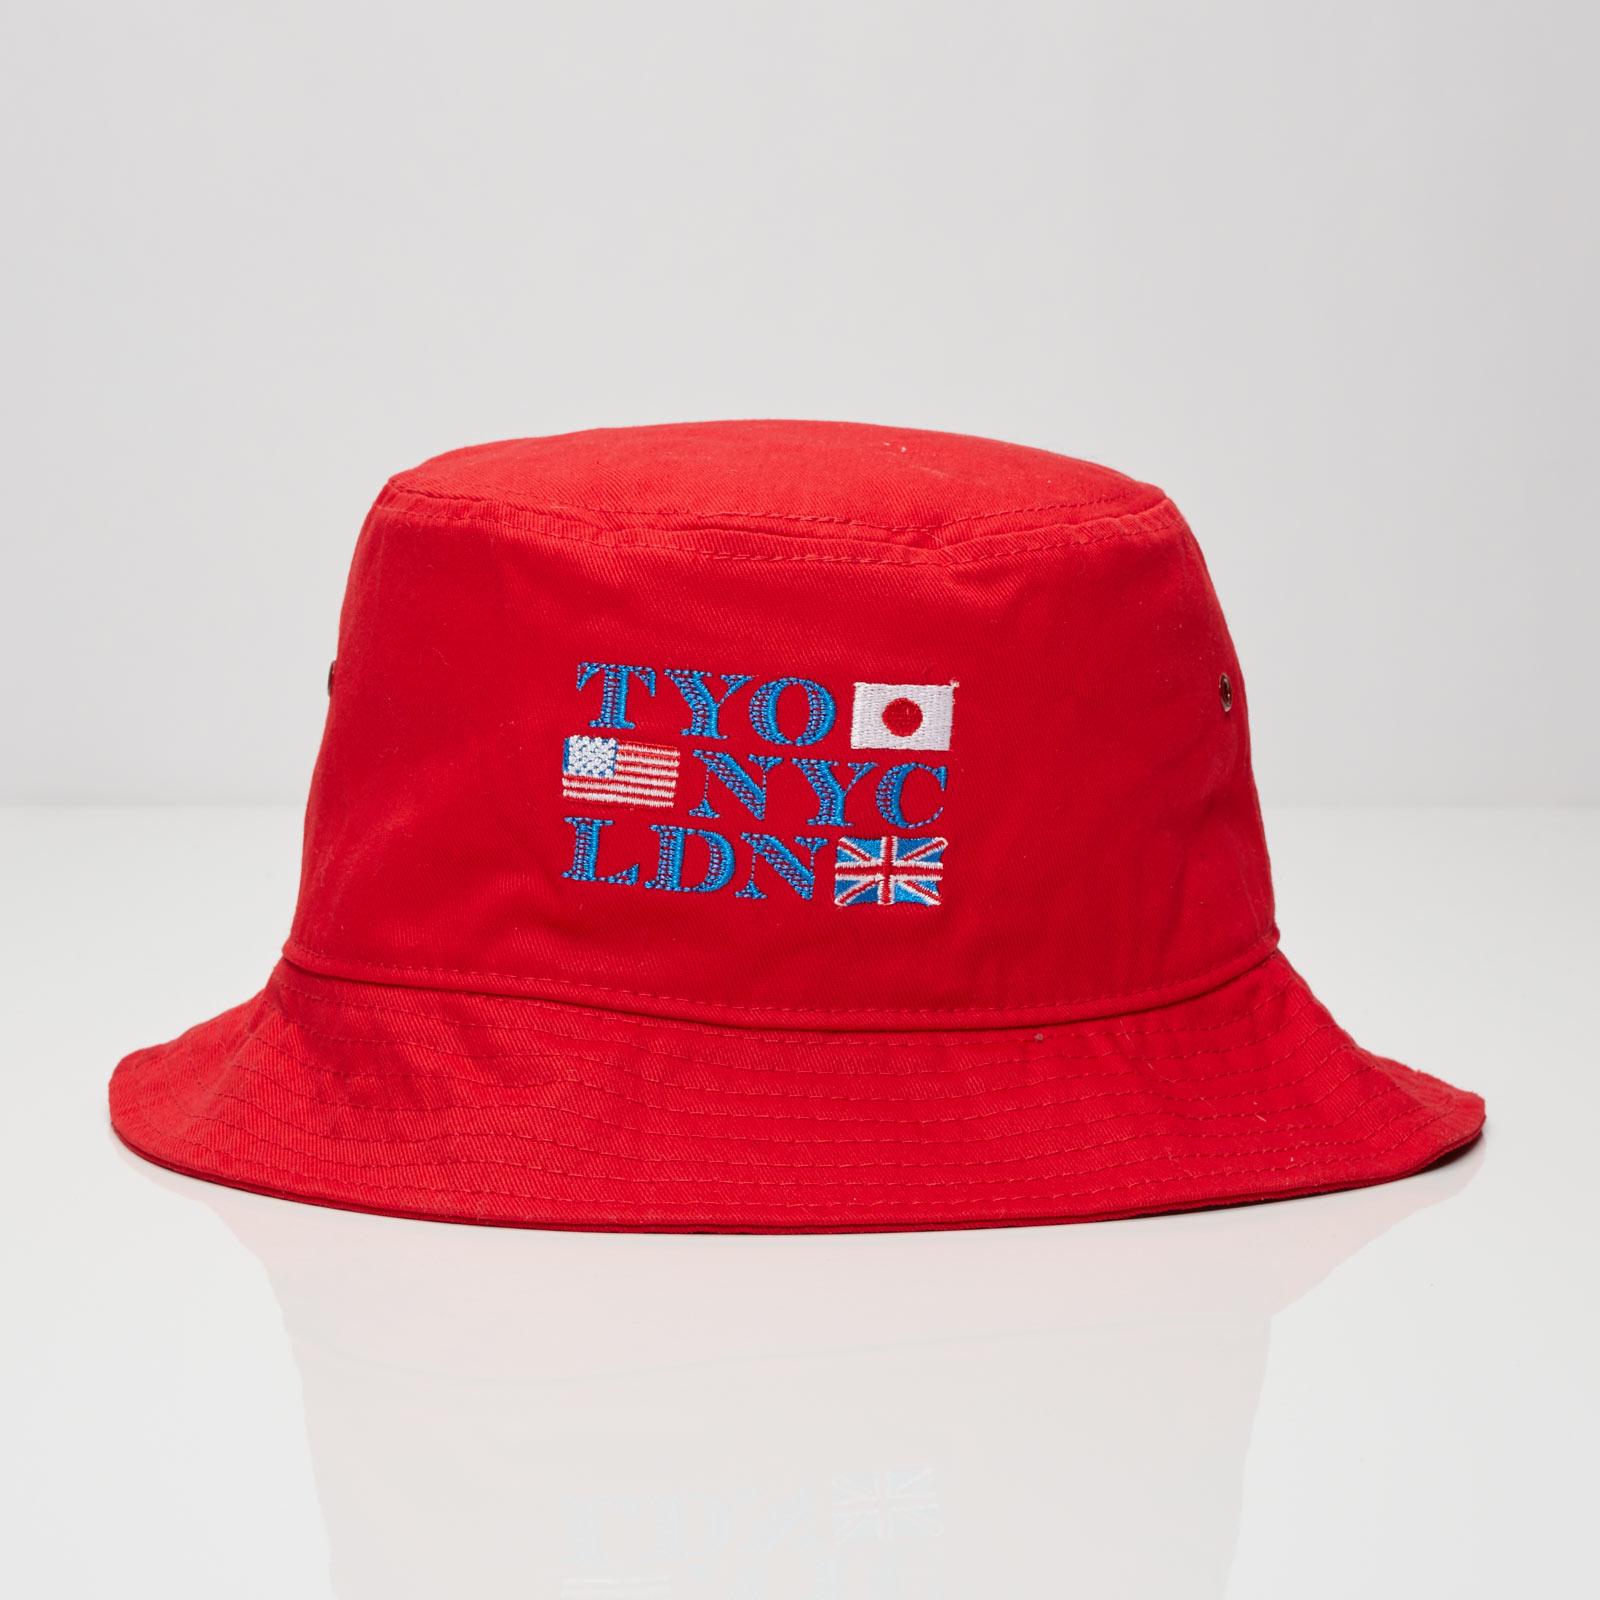 10f8d36d35f Billionaire Boys Club Alliance Bucket Hat - Eusum16026red - Sneakersnstuff